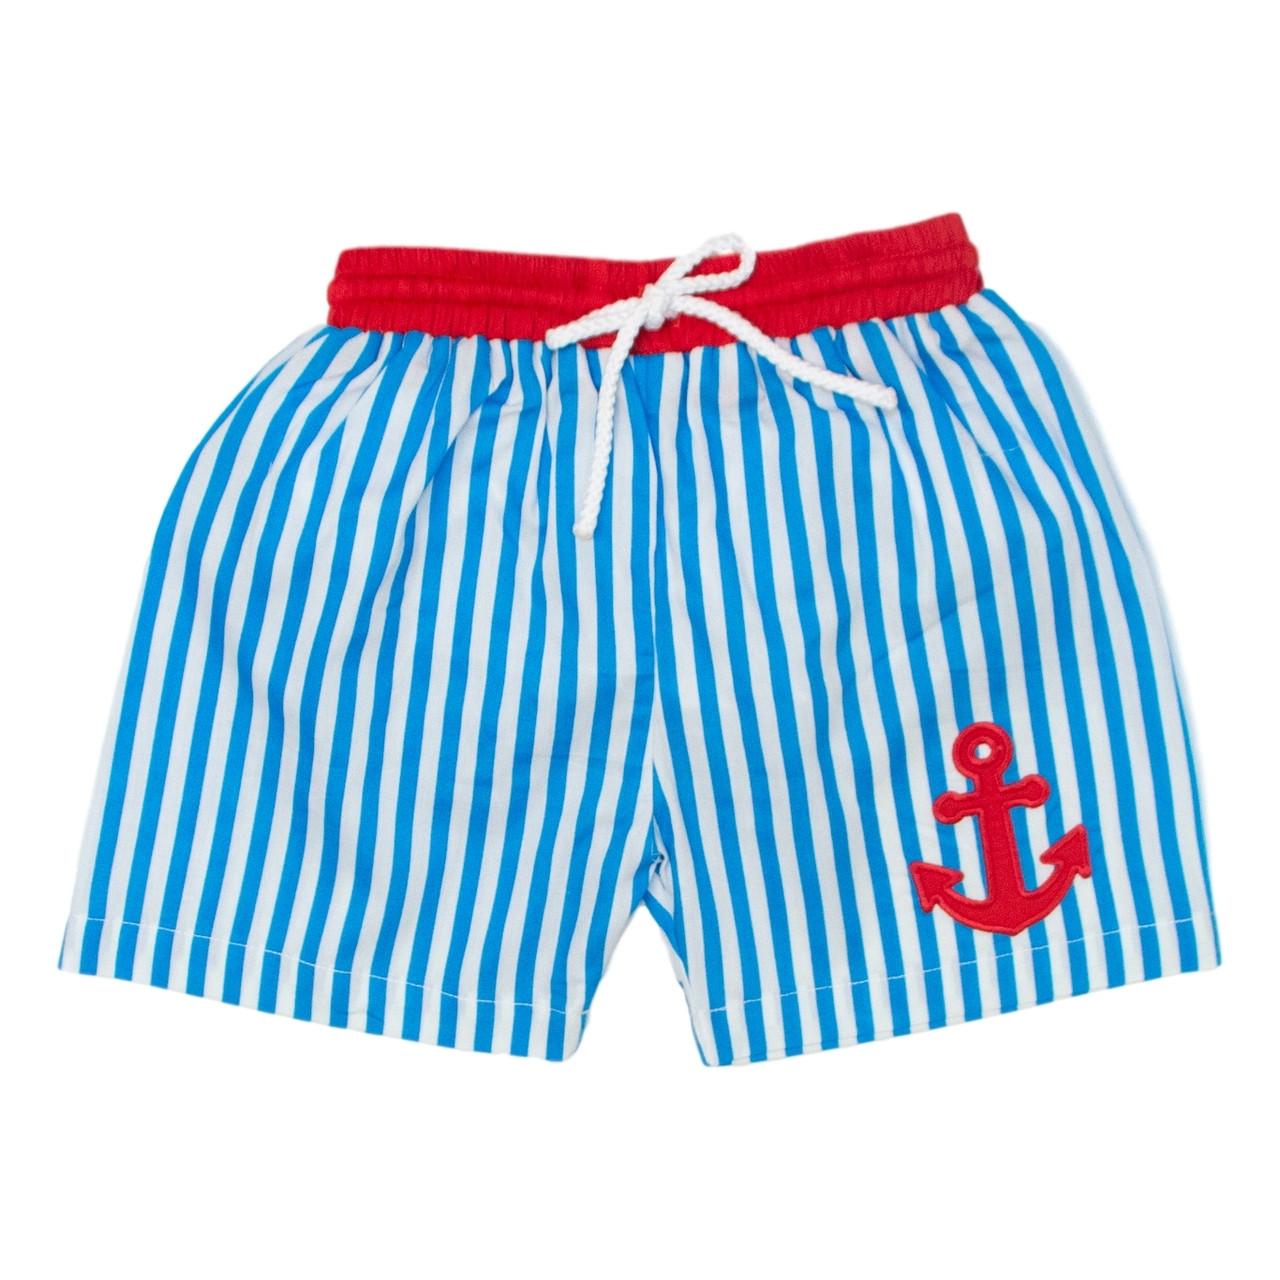 53b55773ce Turquoise Stripe Anchor Swim Trunks